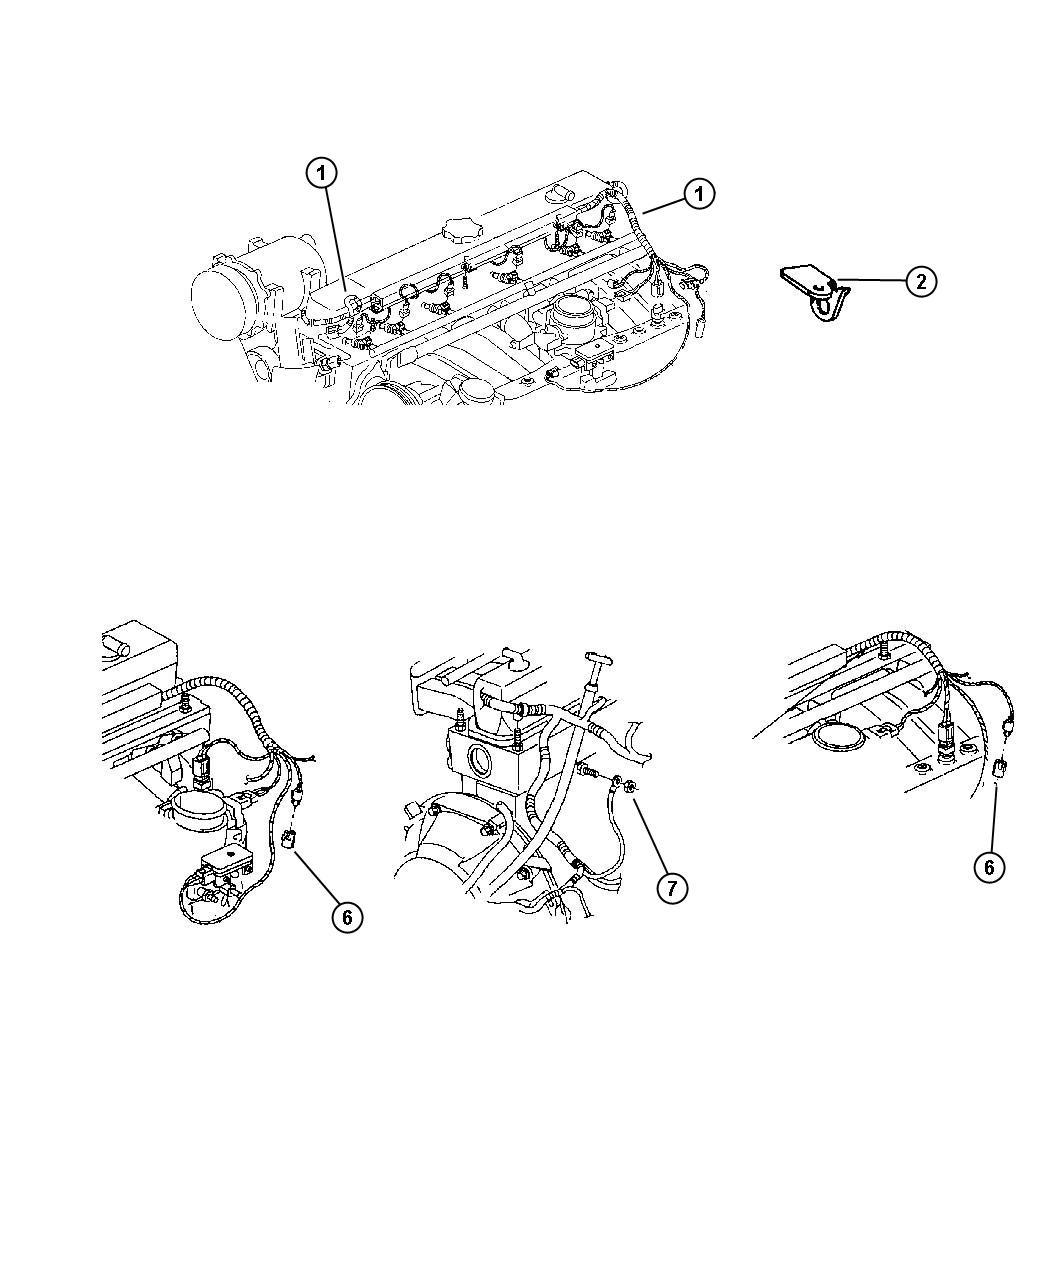 Jeep Wrangler Cap Screw Cover Courtesy Lamps Diagnostic